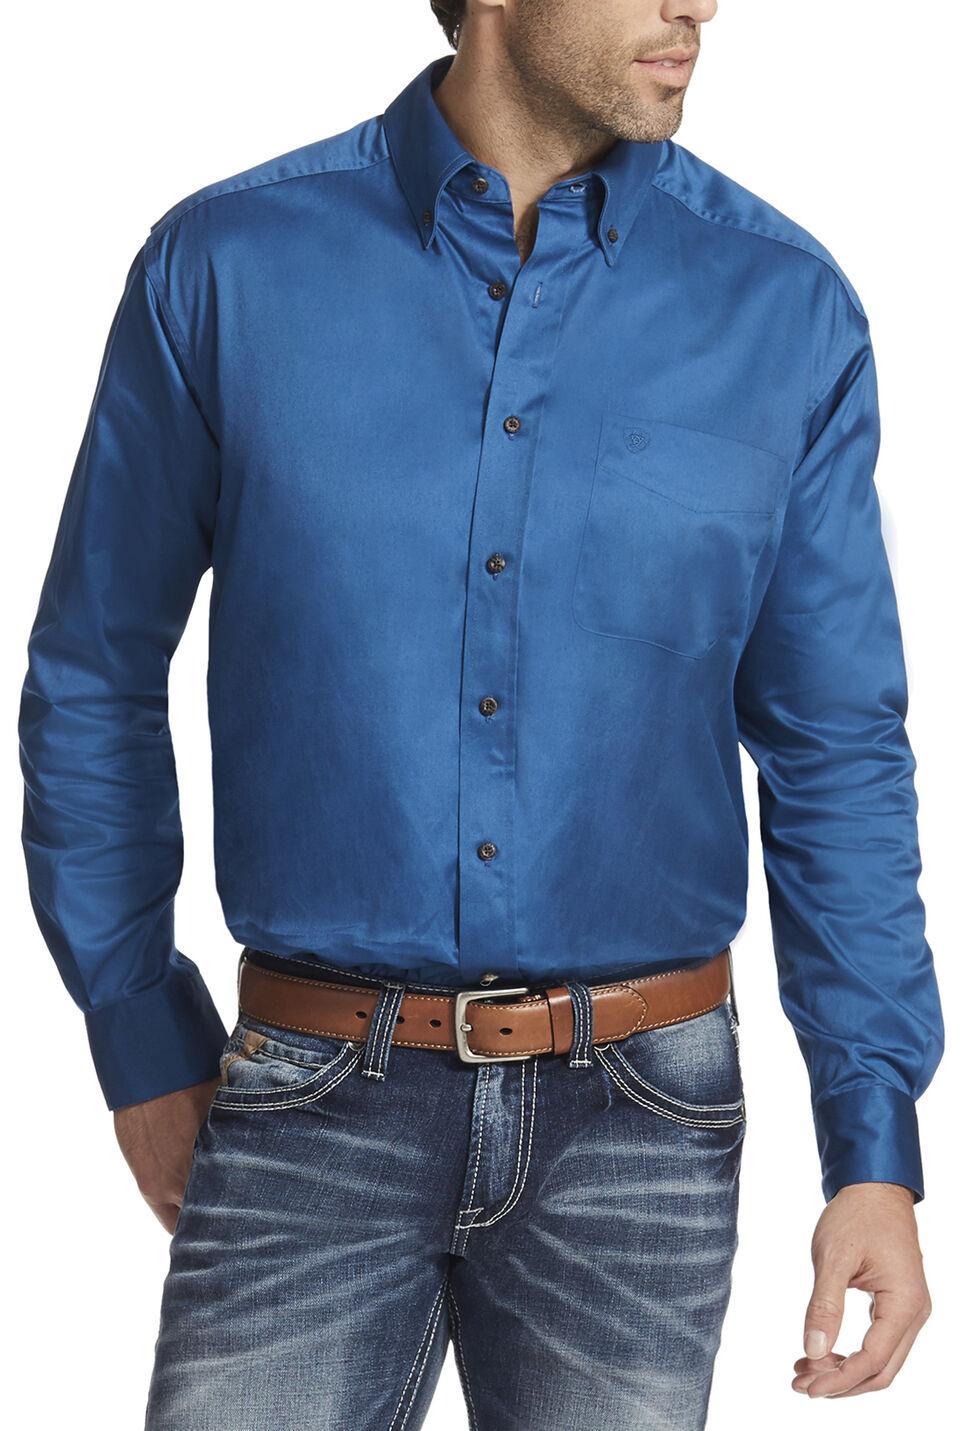 Ariat Men's Blue Solid Twill Button Down Shirt - Big & Tall, Blue, hi-res